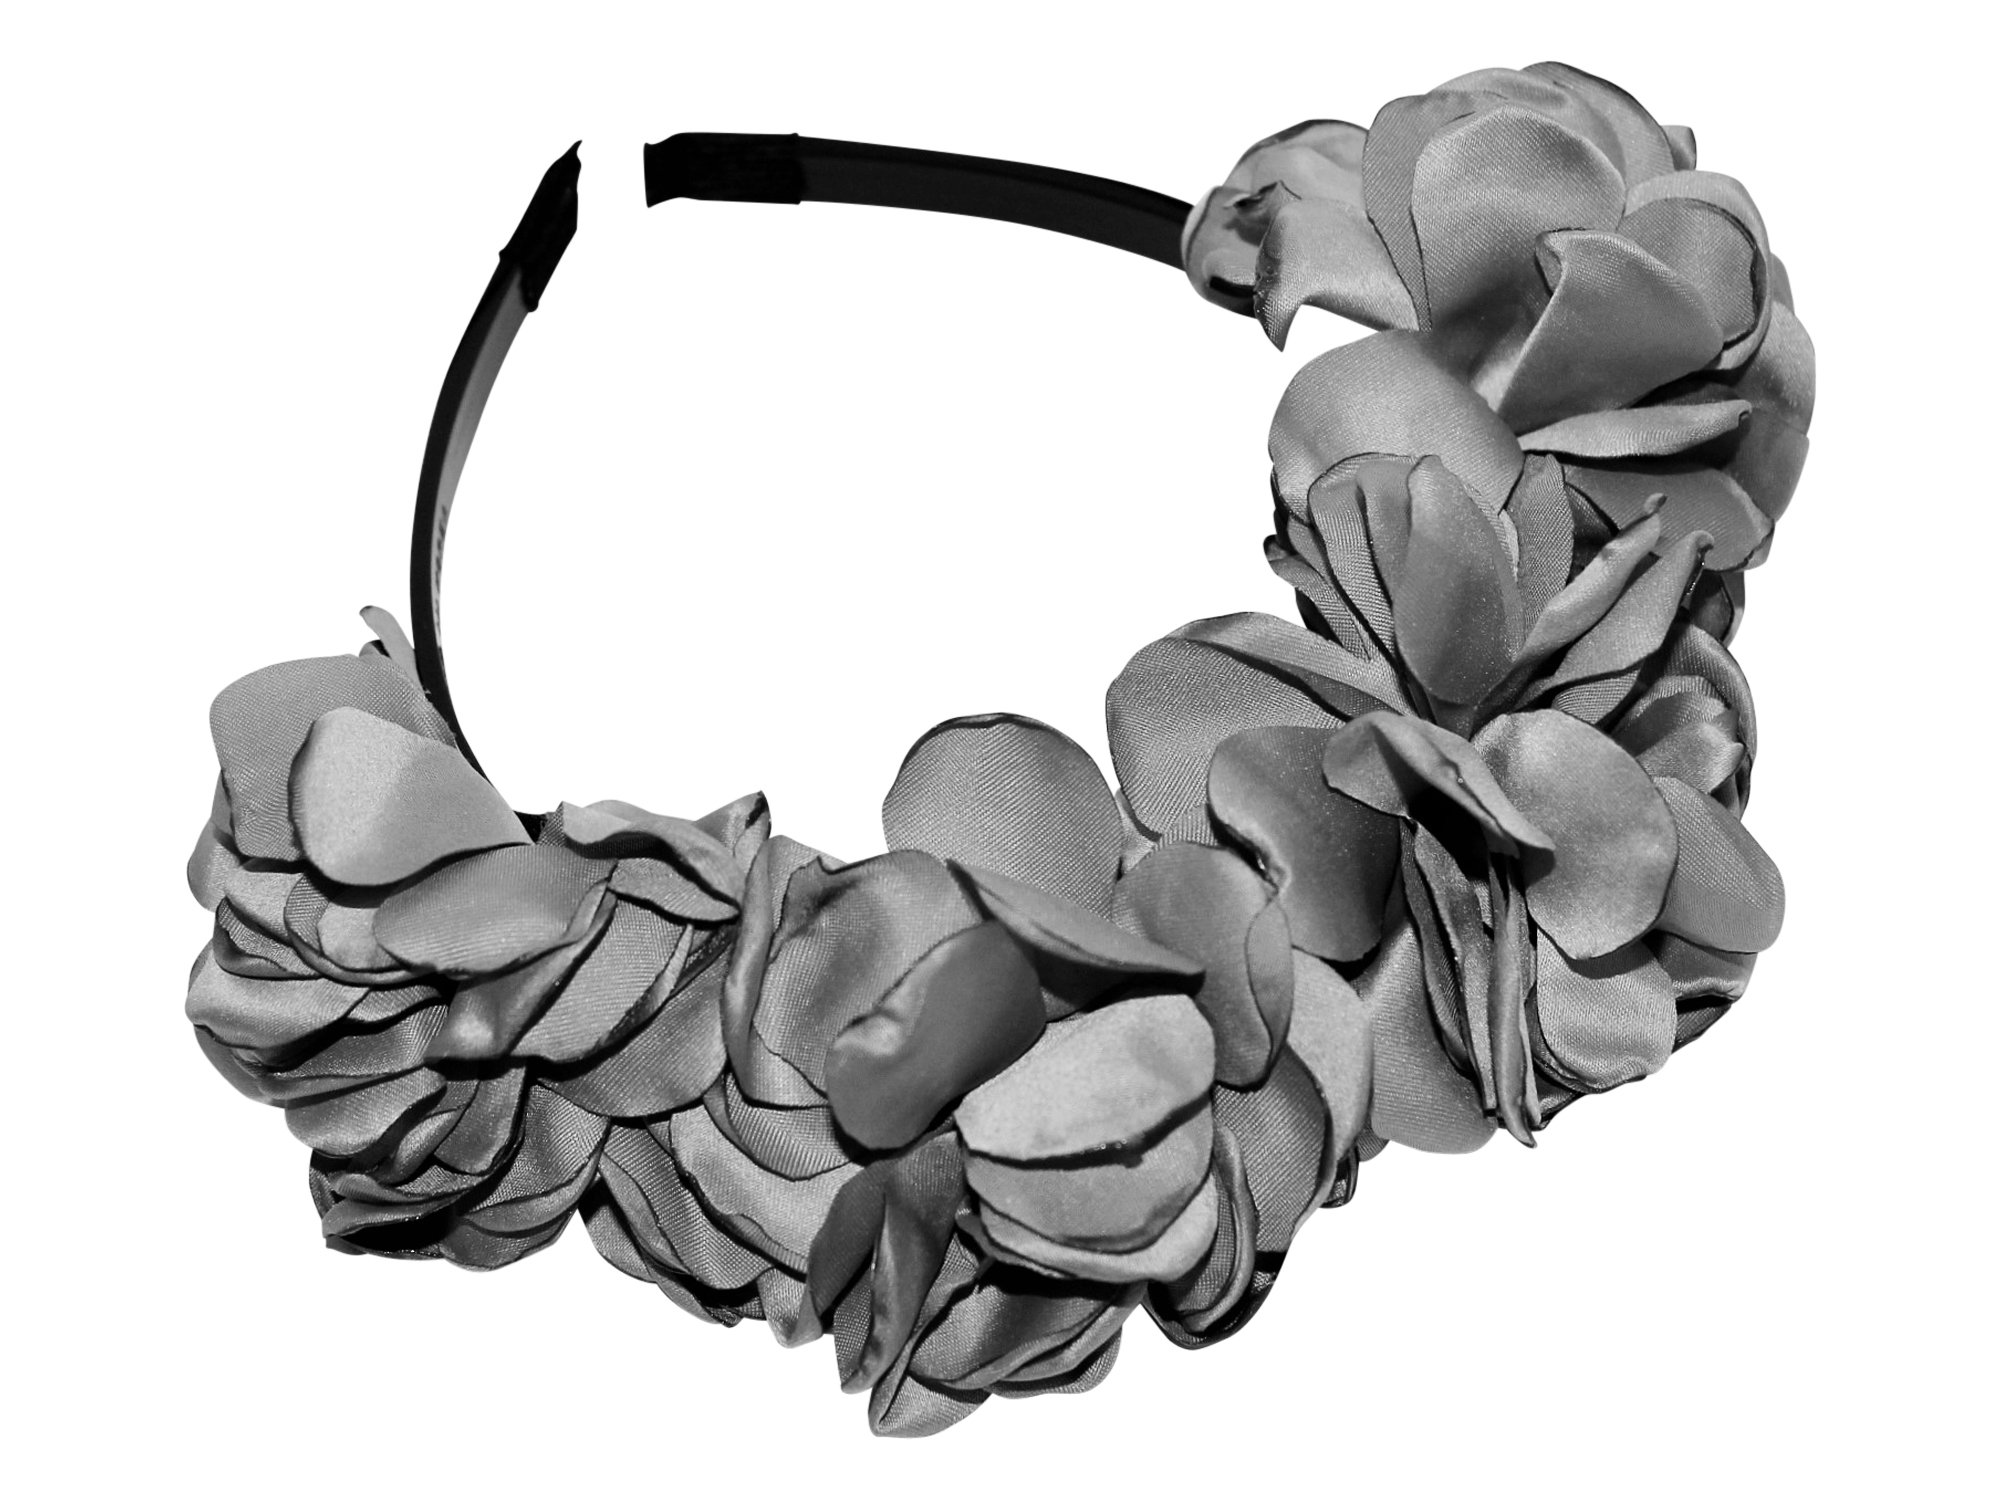 Be Unique Bowtique, Grey Silk Rose Petal Flower Headband with Teeth for Girls, Children Plastic Headband for the Holidays by Be Unique Bowtique